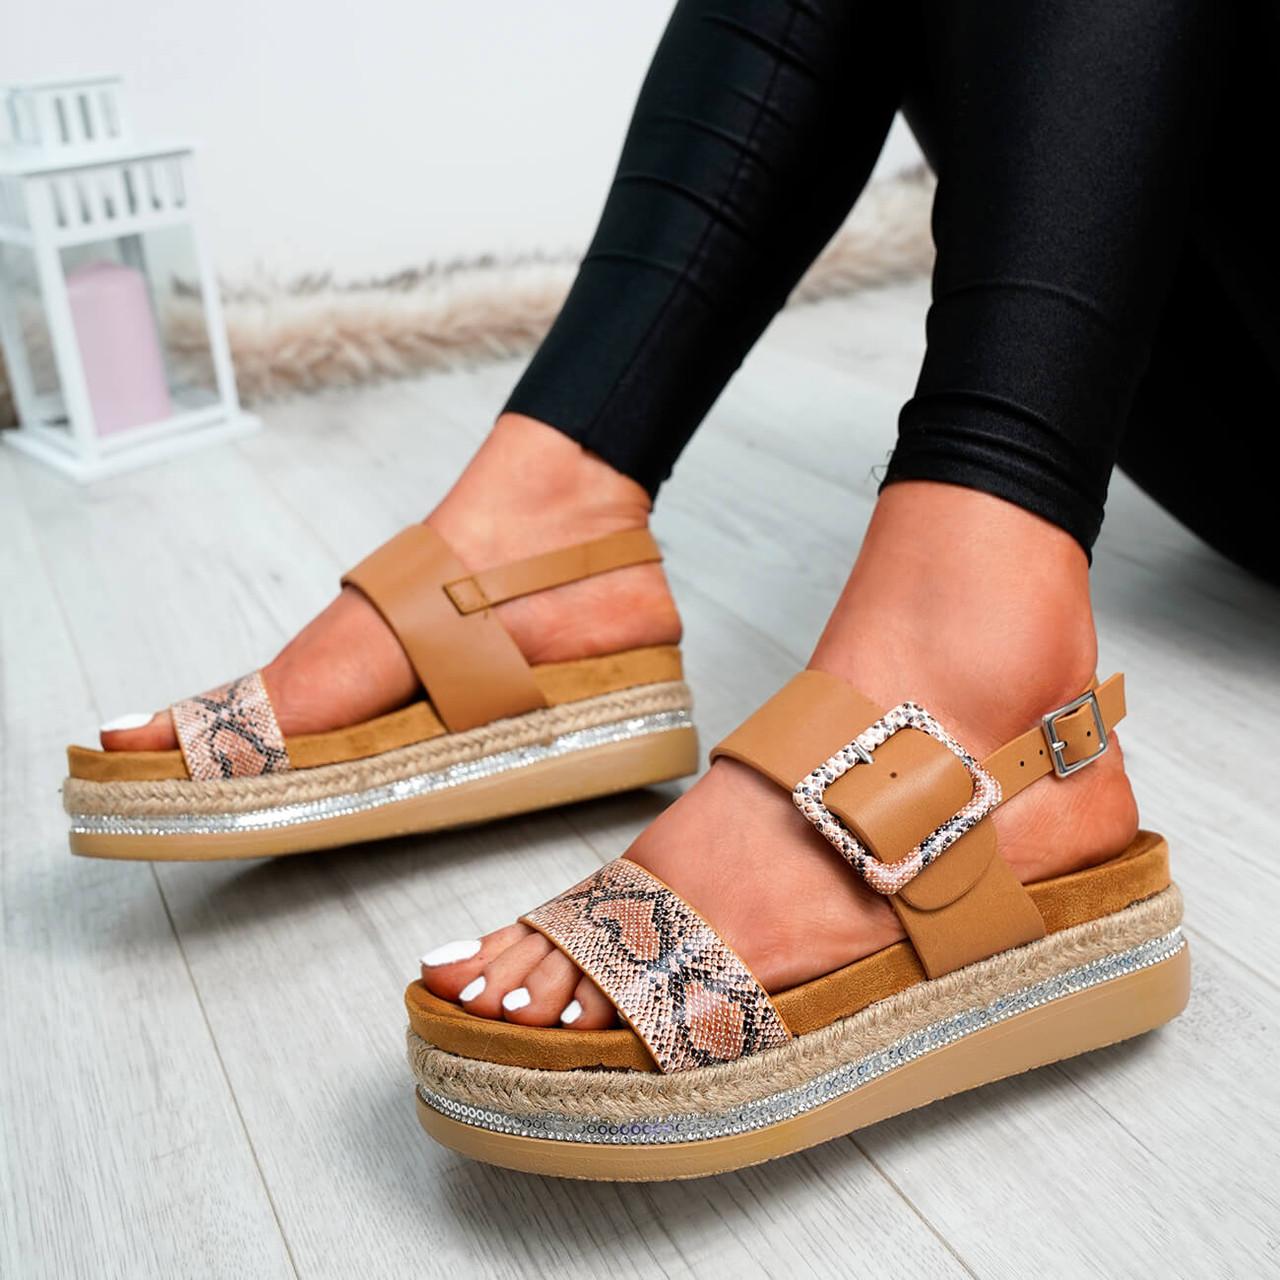 New Womens Platform Wedge Heel Summer Sandals Diamante Ankle Strap Shoes Size